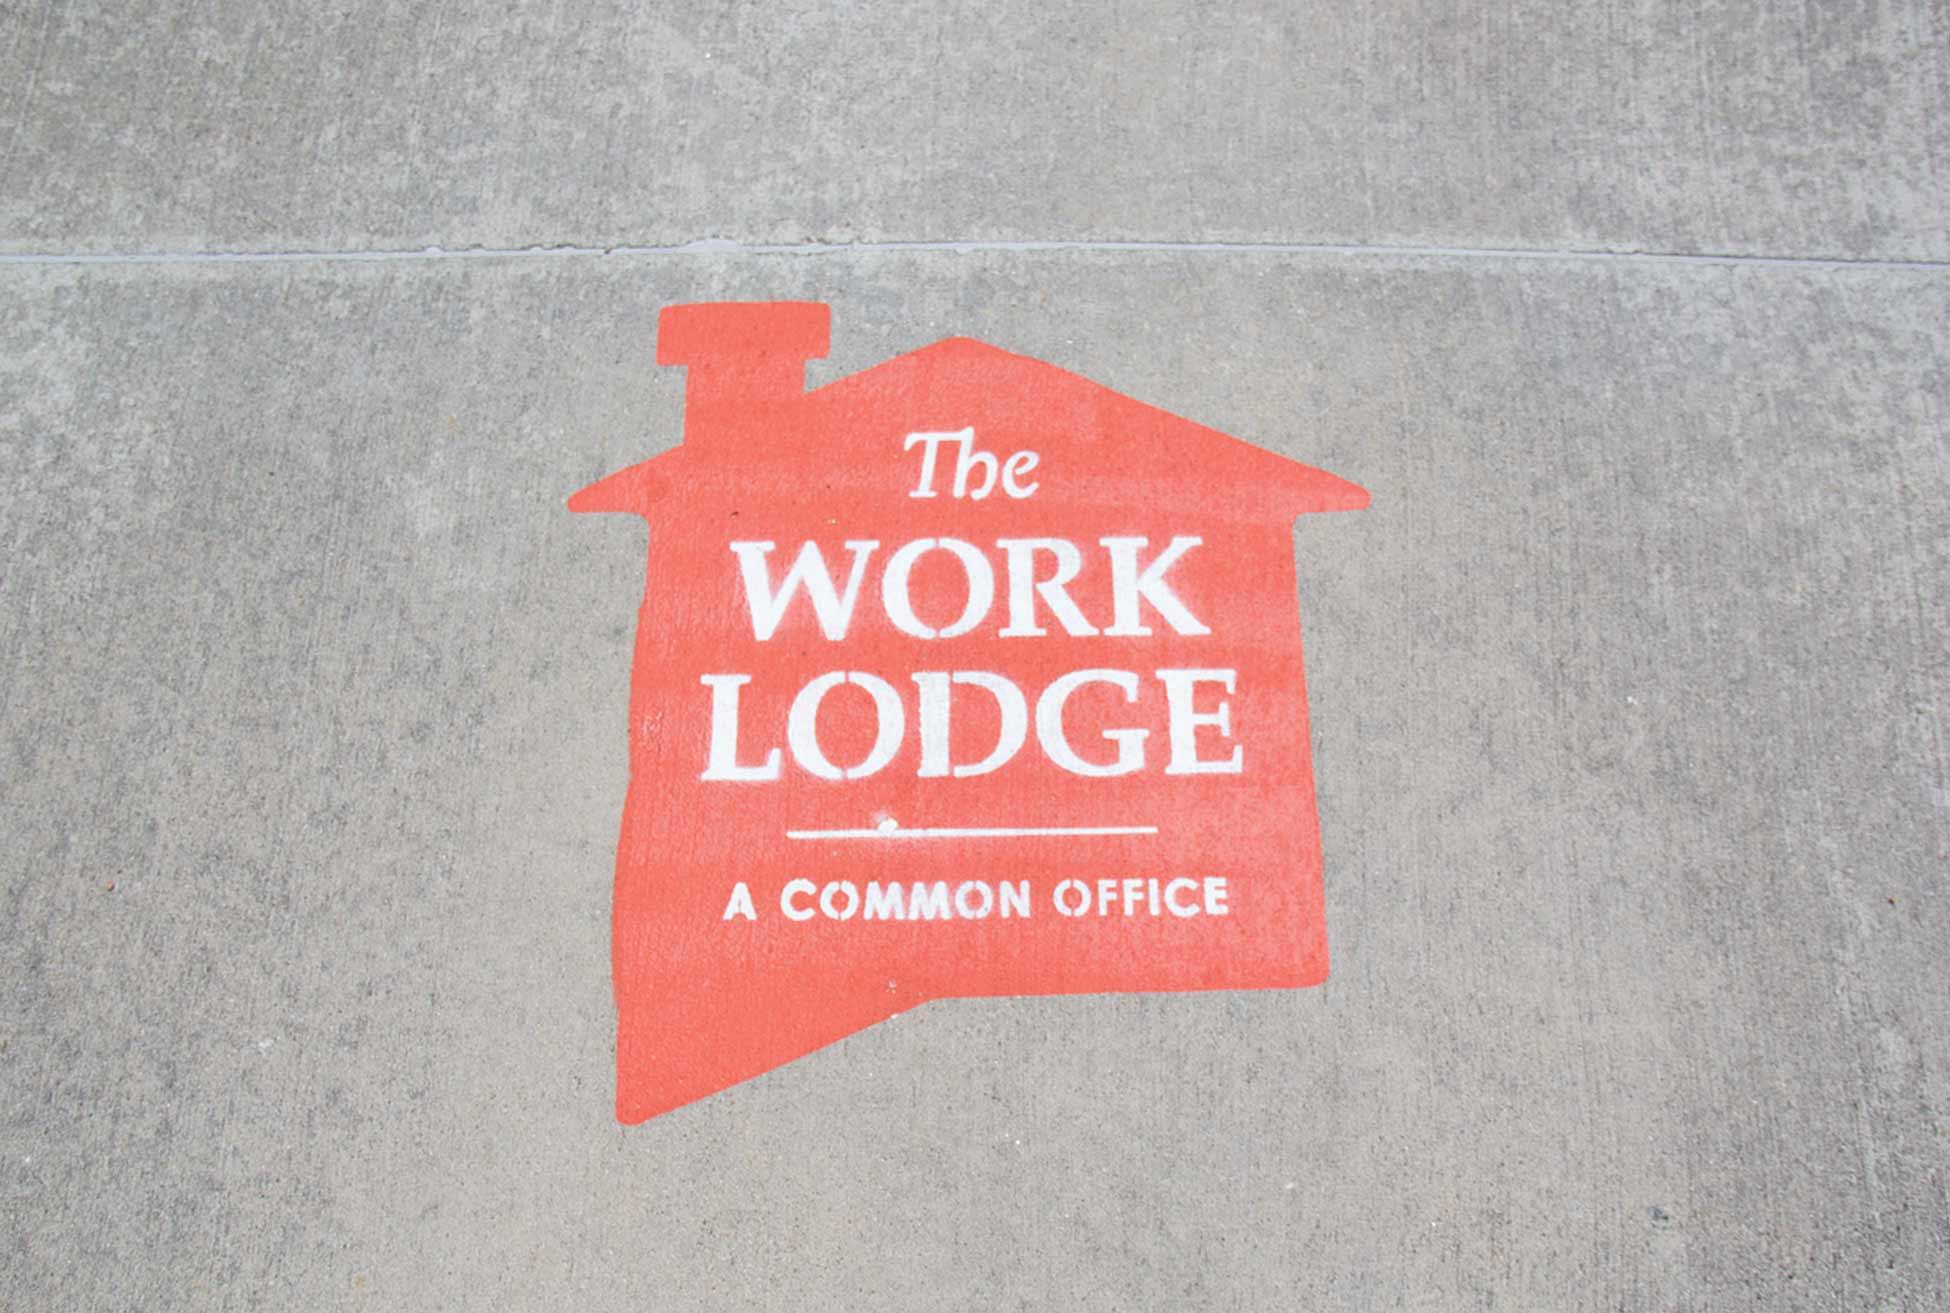 theworklodge_parking-spot.jpg